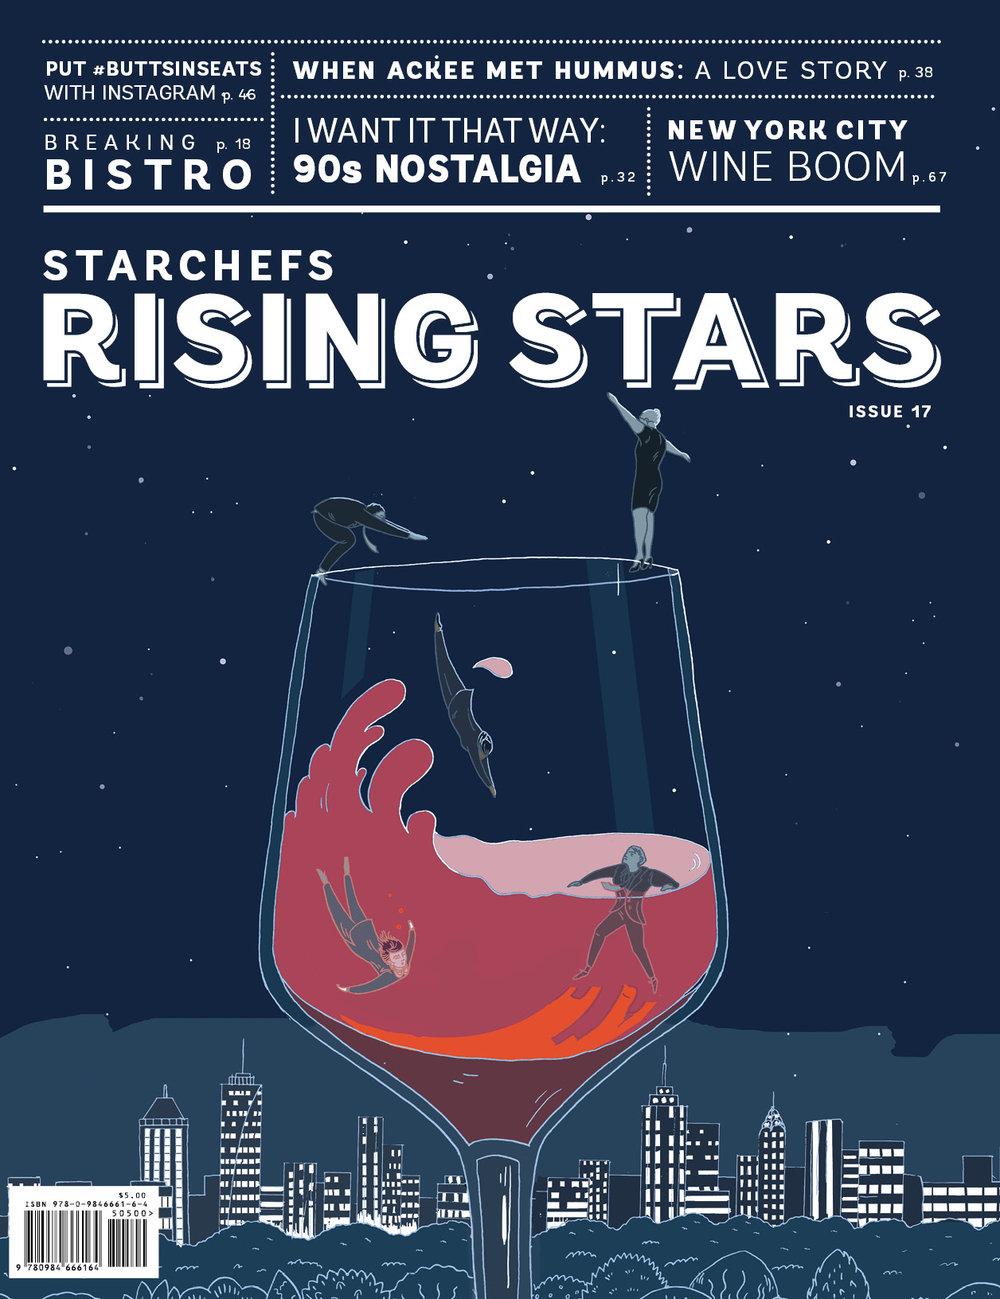 rsny2017-magazine-cover.jpg